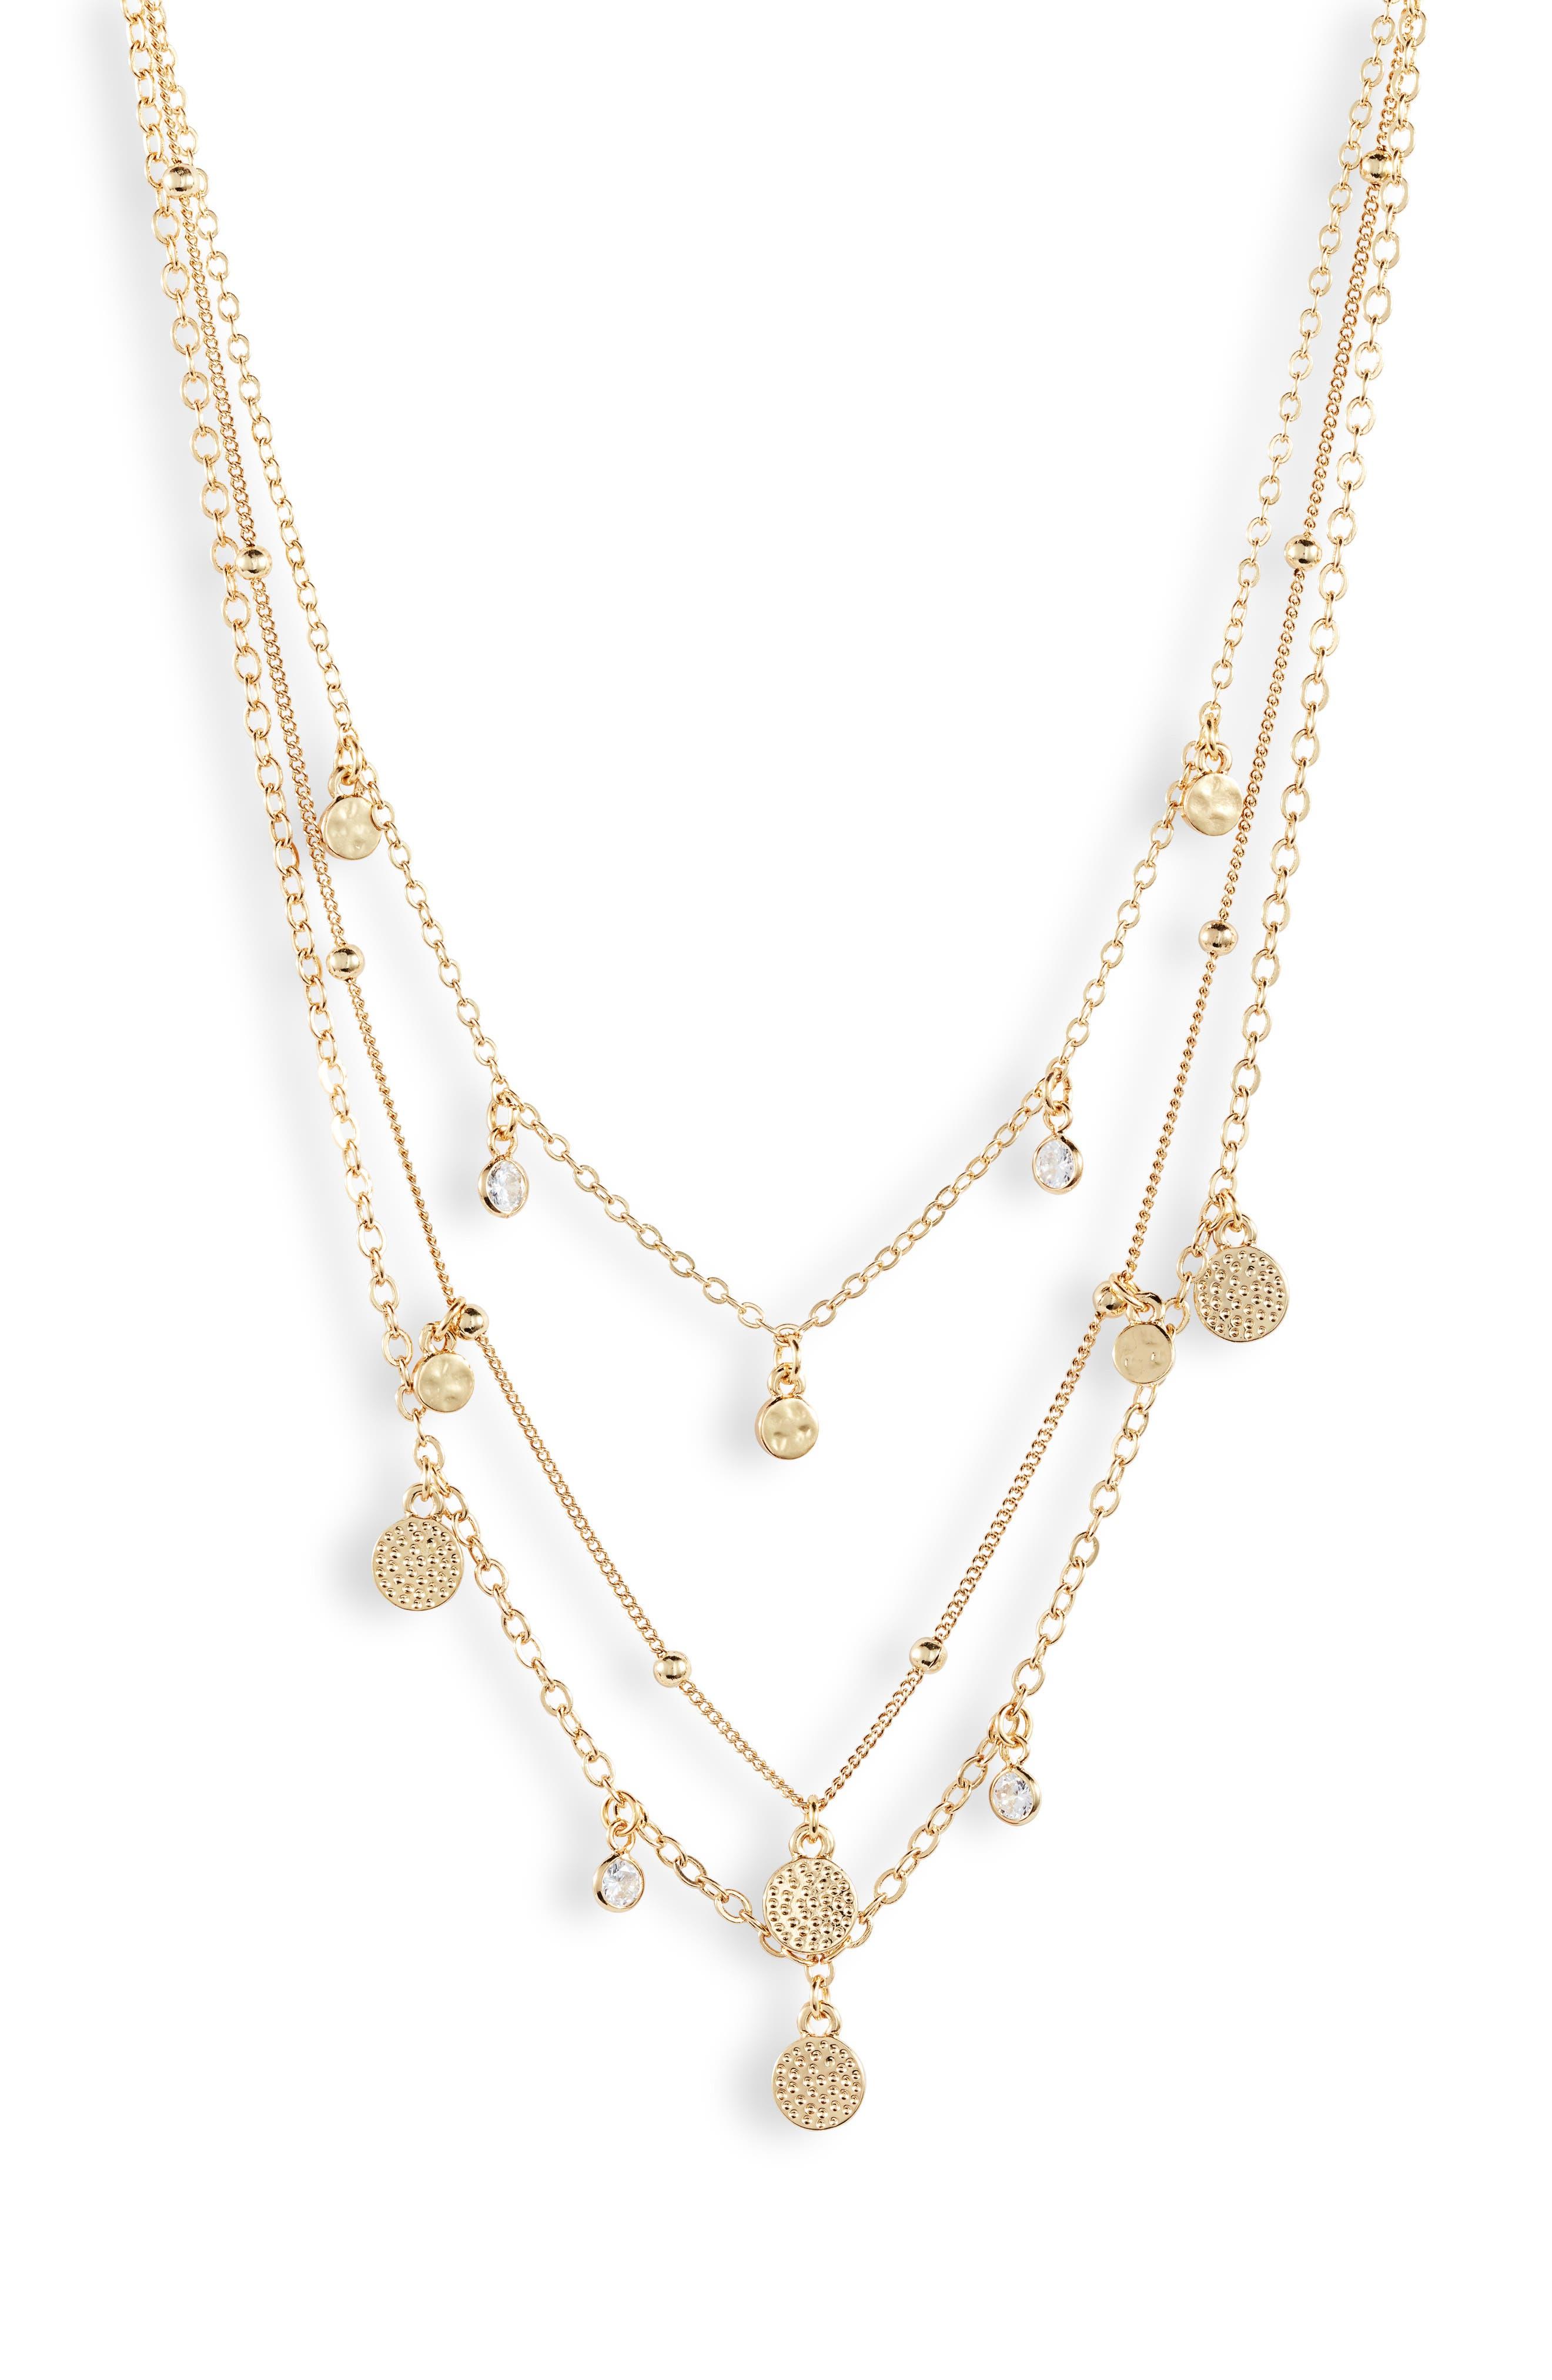 3460b89063512 Women's Multi-Strand Necklaces | Nordstrom